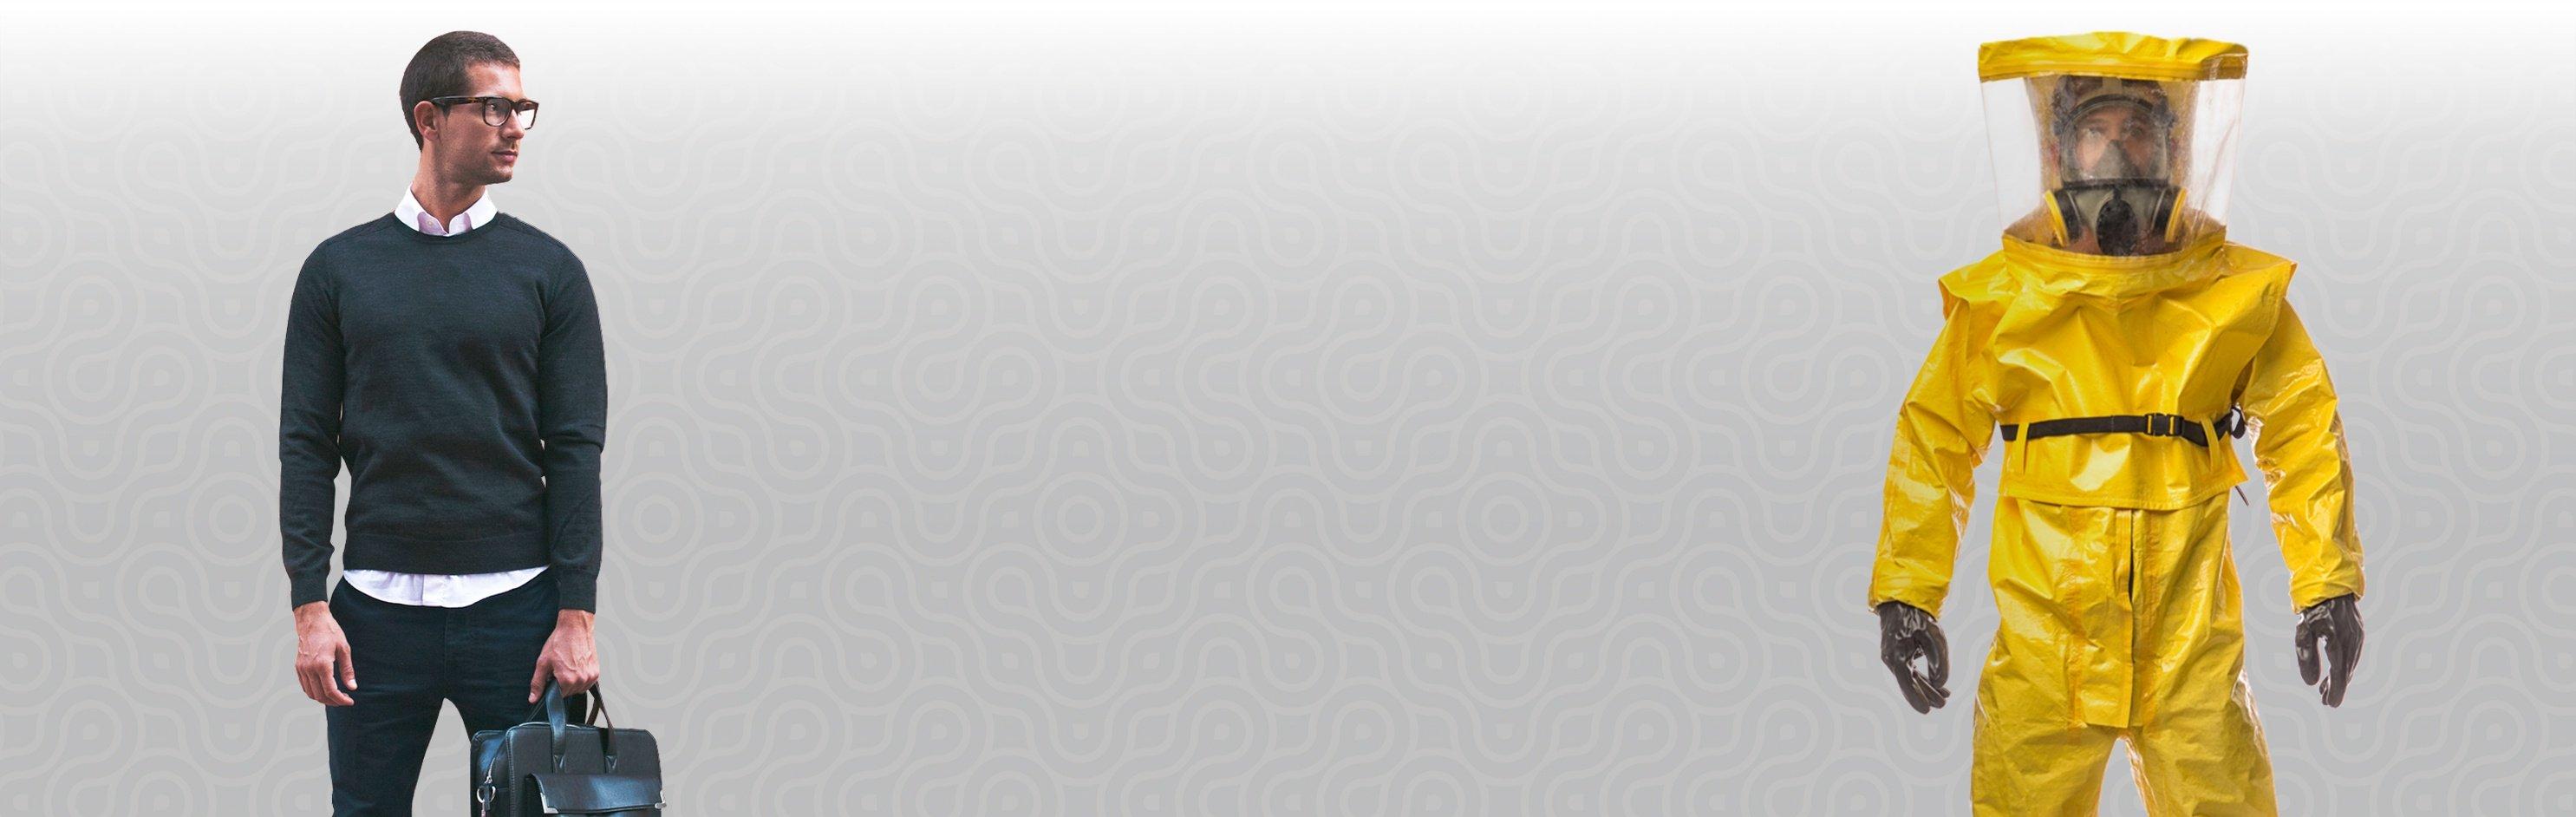 Homepage-Banner_Hazmat.jpg